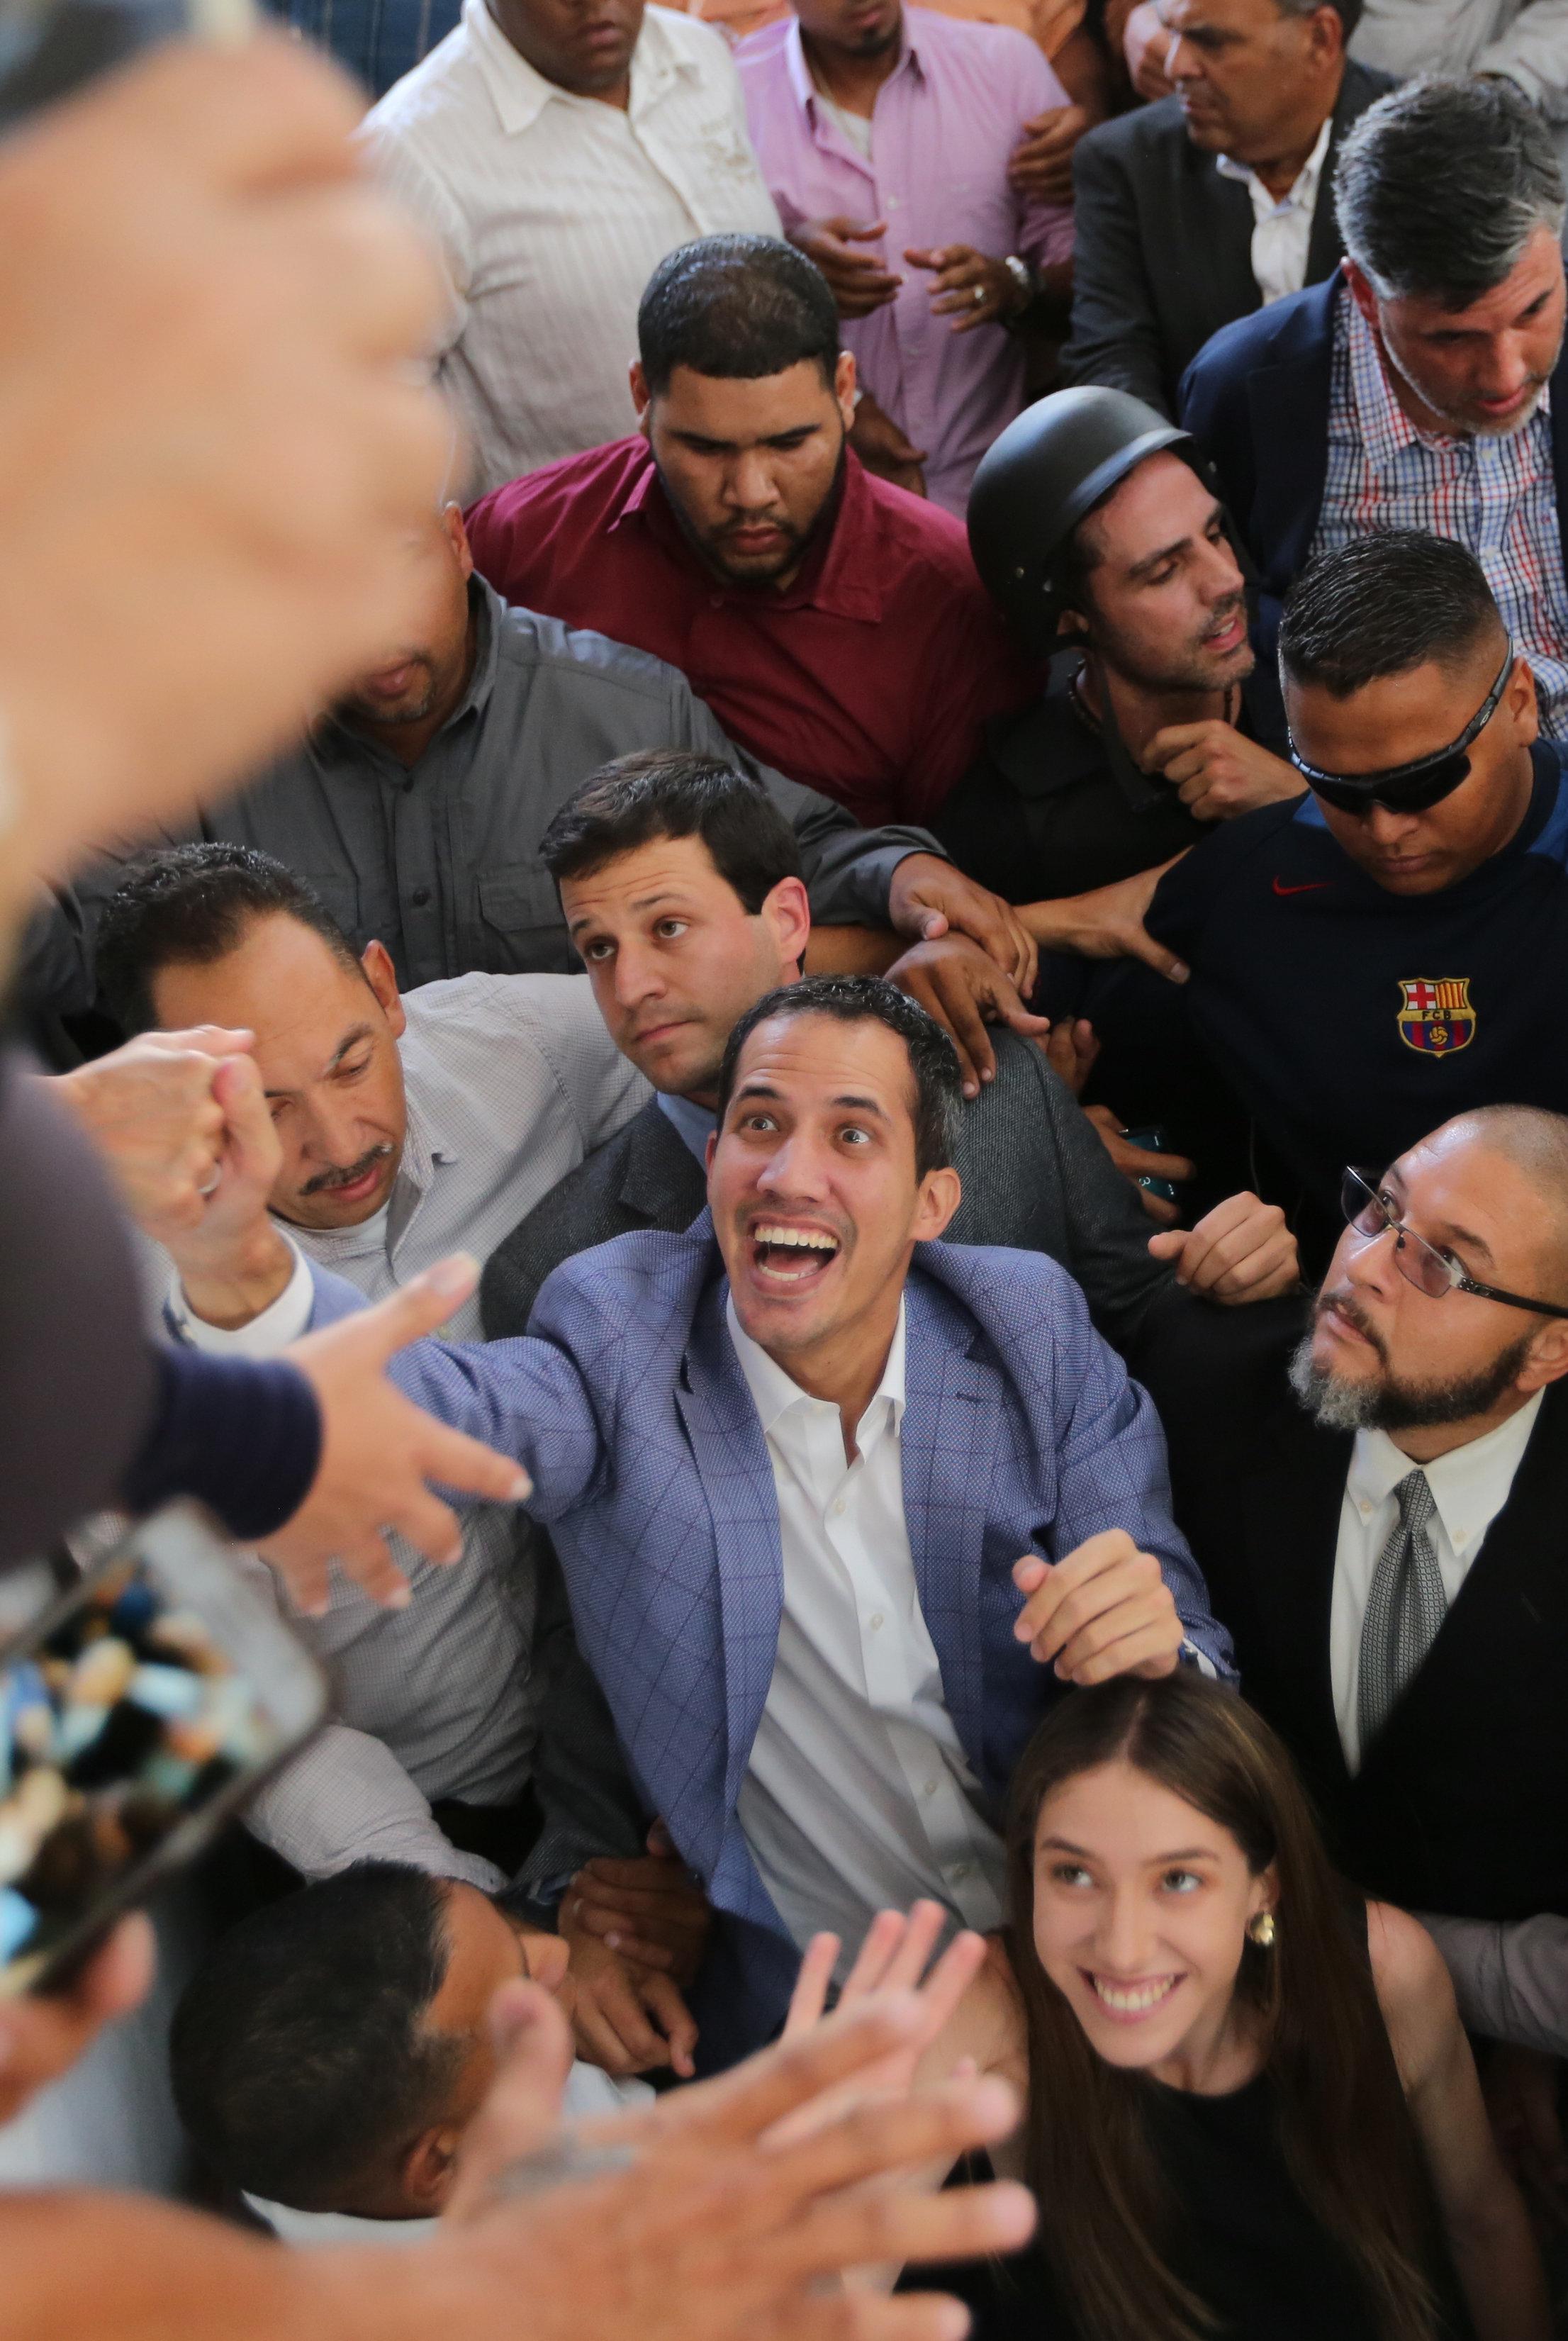 Venezuelan National Assembly President Juan Guaidó greets supporters in the Hatillo municipality of Caracas, Venezuela